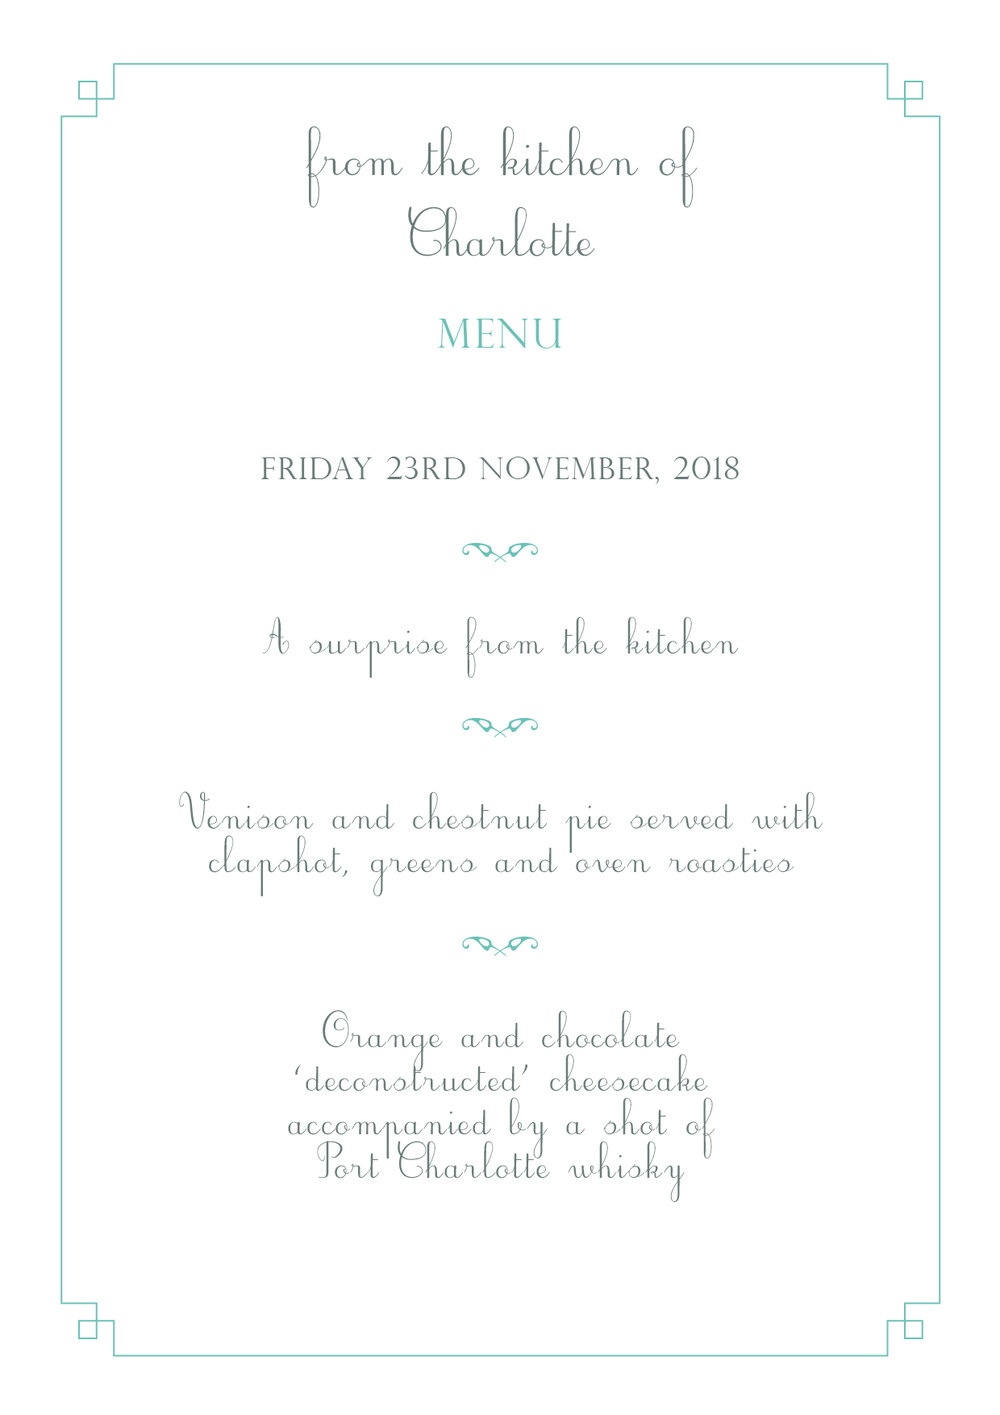 Charlotte's menus 23.11.18.jpg